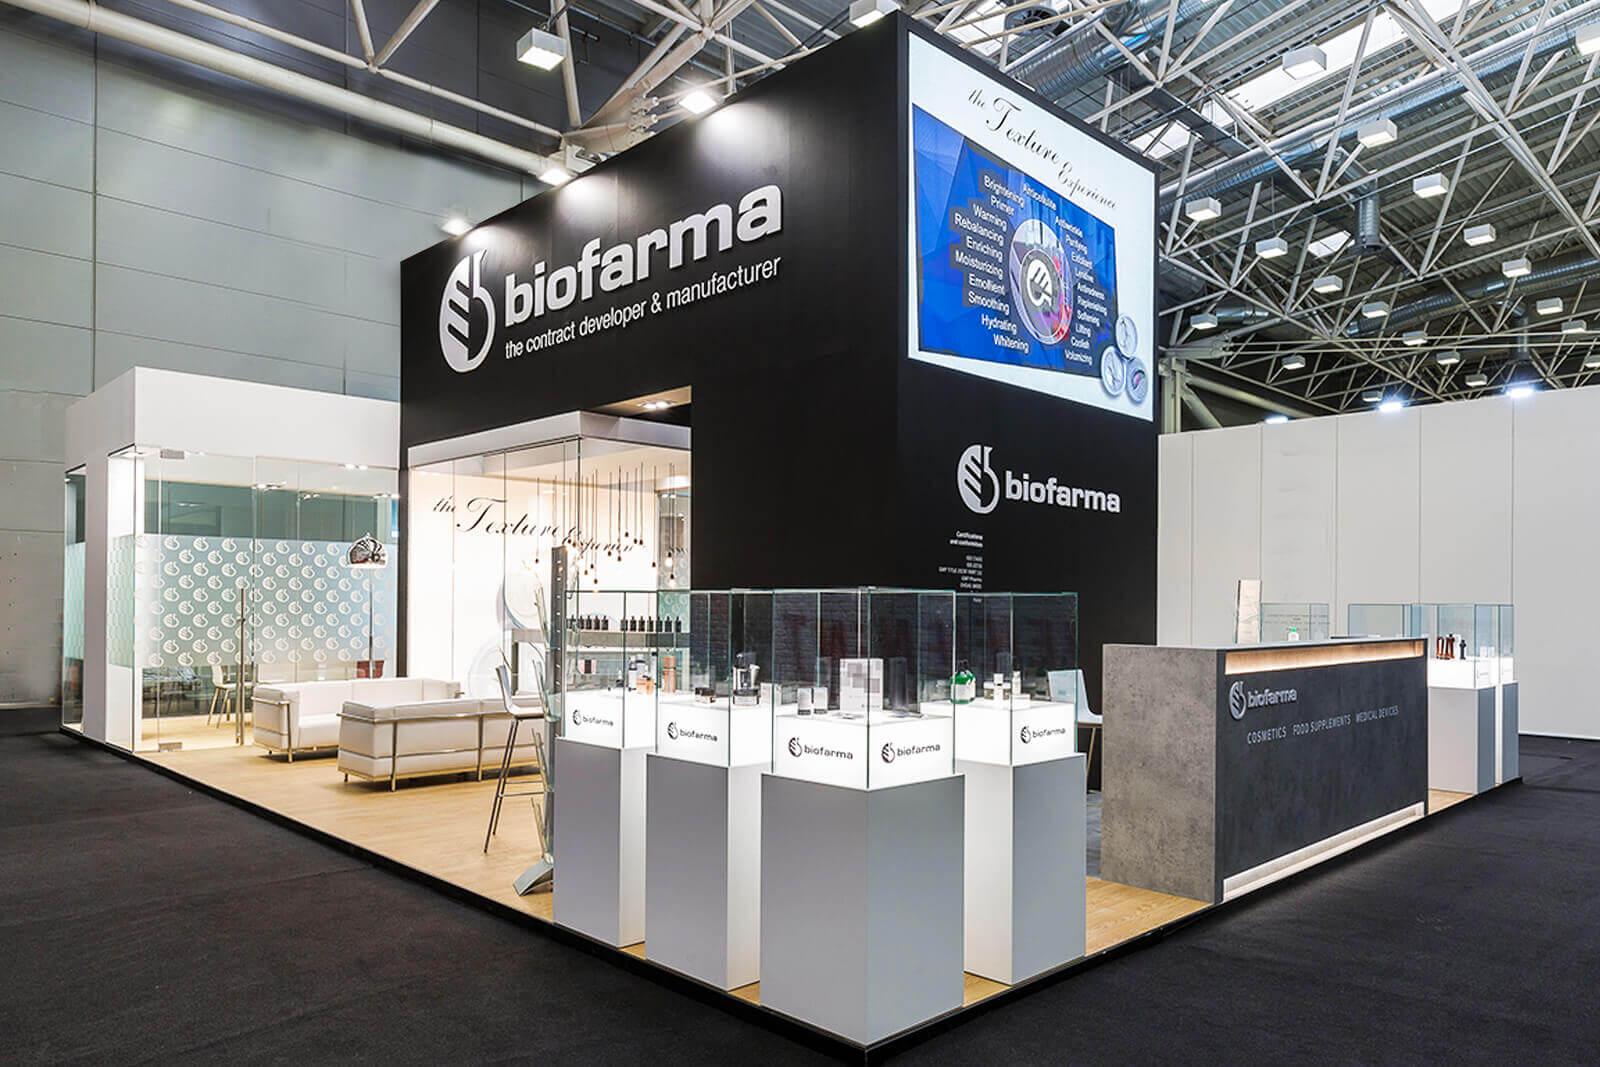 Cosmopack Bologna - Biofarma - Dass stand fieristici